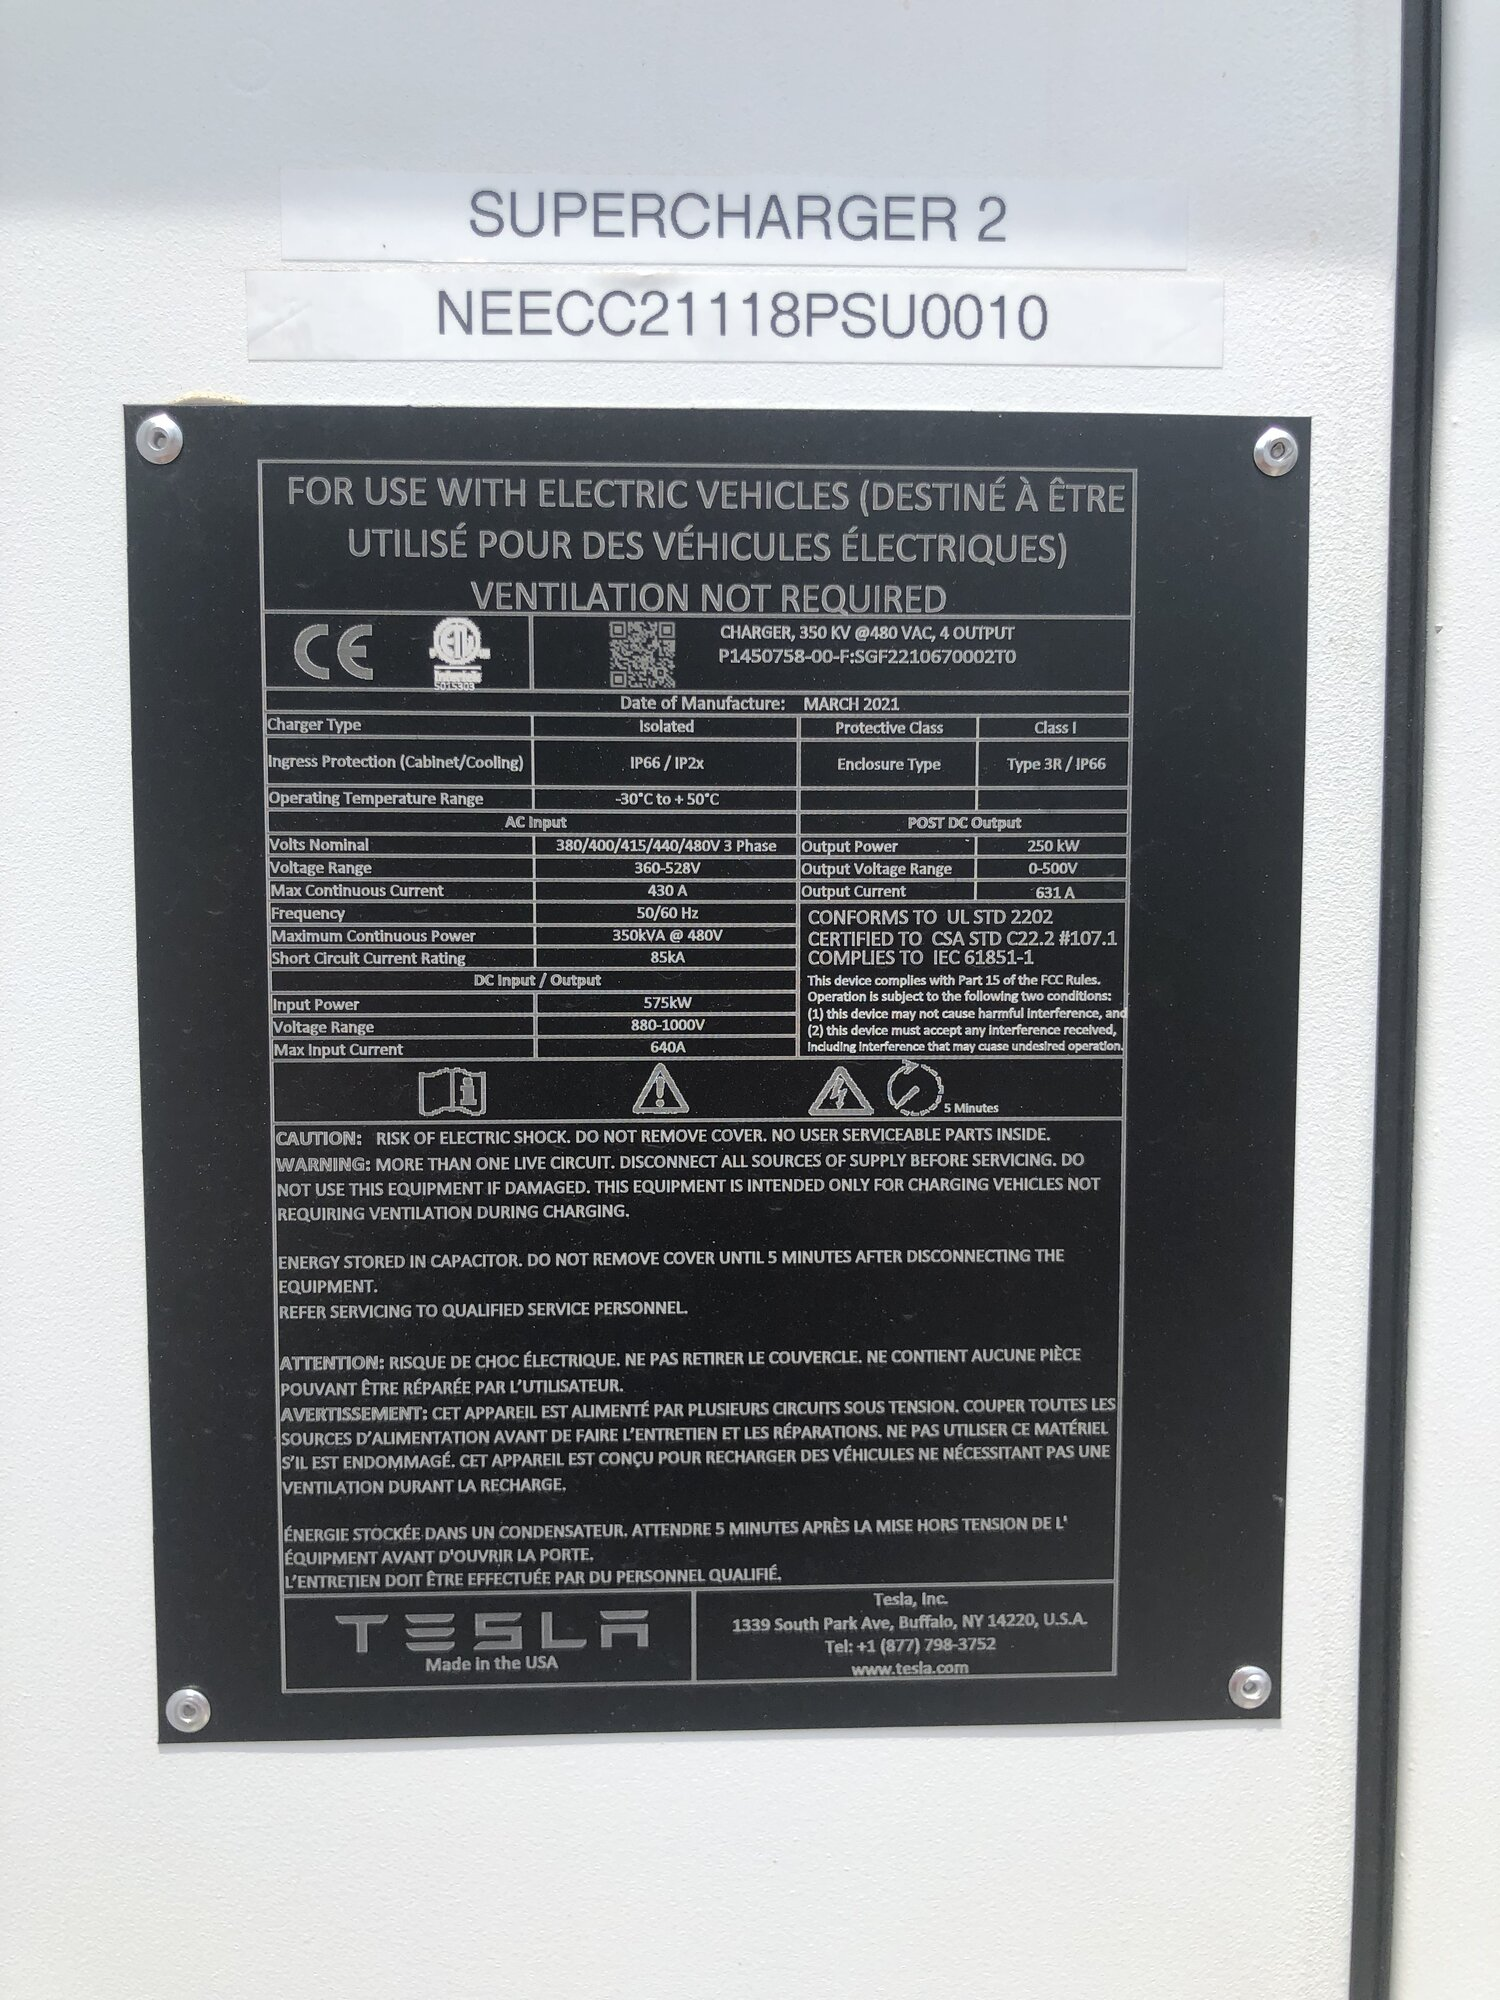 7CE1720D-0915-4852-AA7C-D5A9C8E52606.jpeg